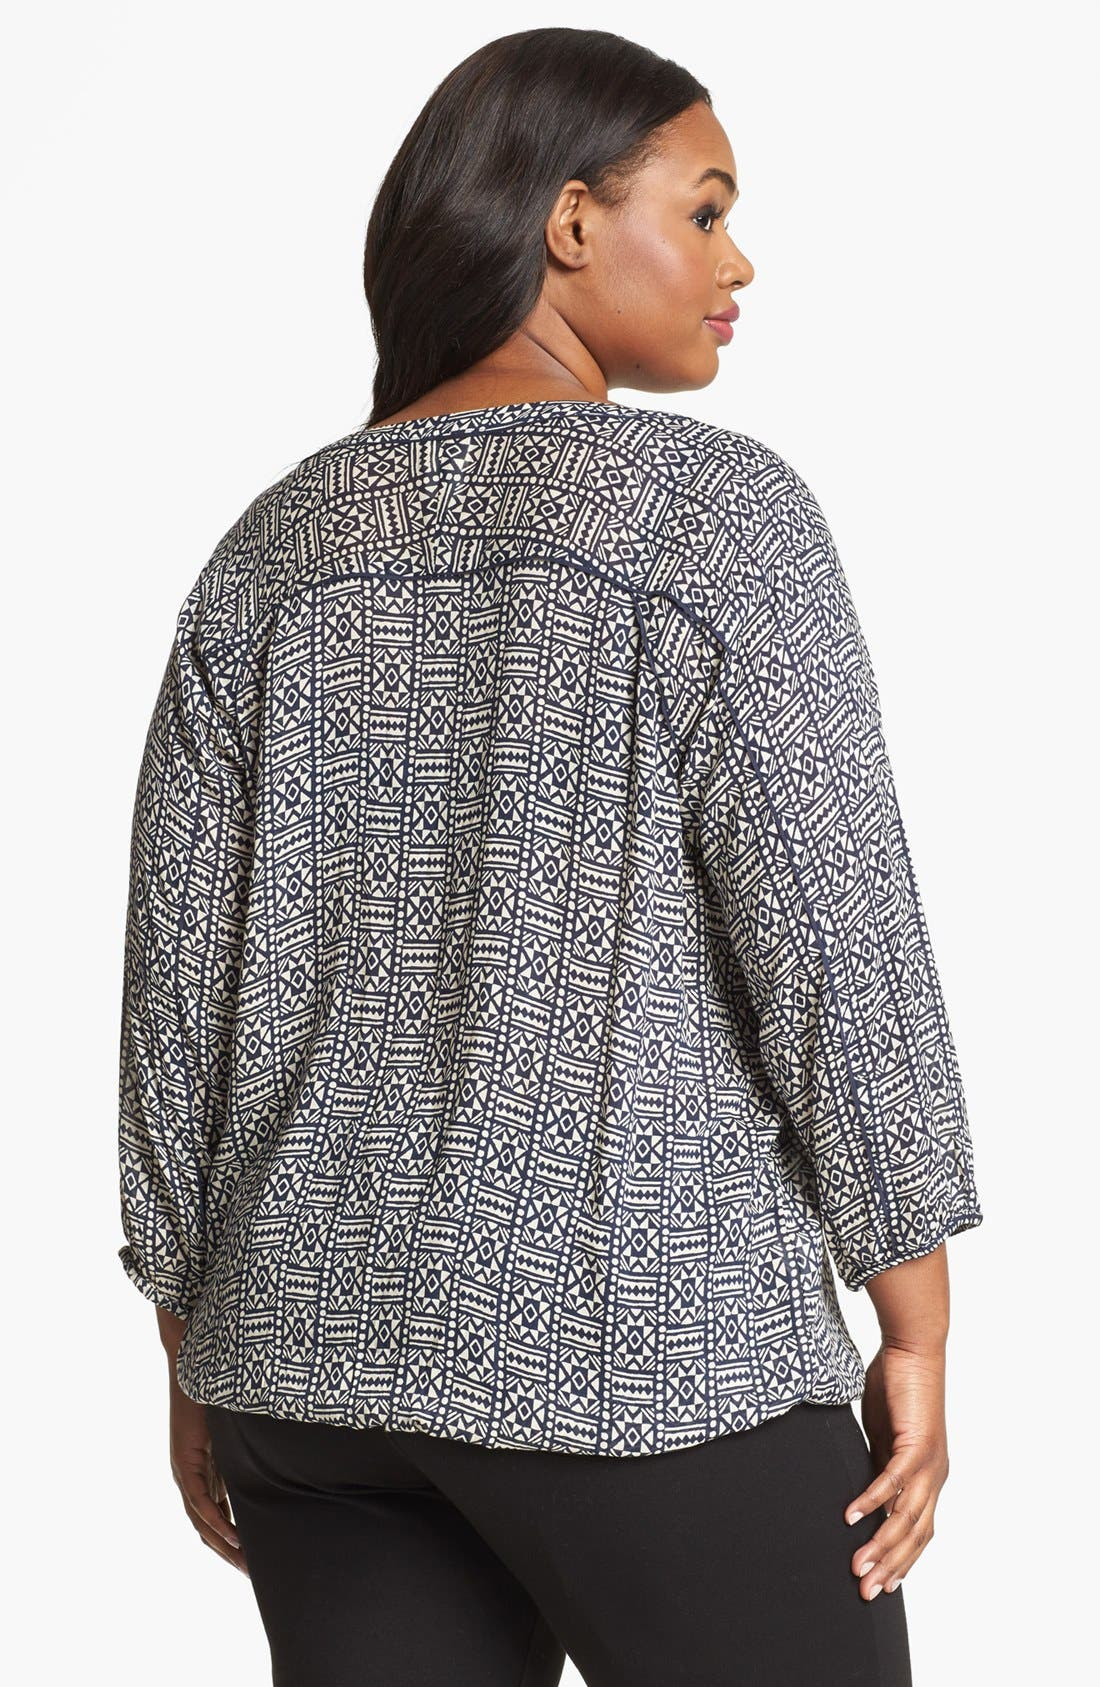 Alternate Image 2  - Lucky Brand 'John Robshaw - Joplin' Print Peasant Top (Plus Size)